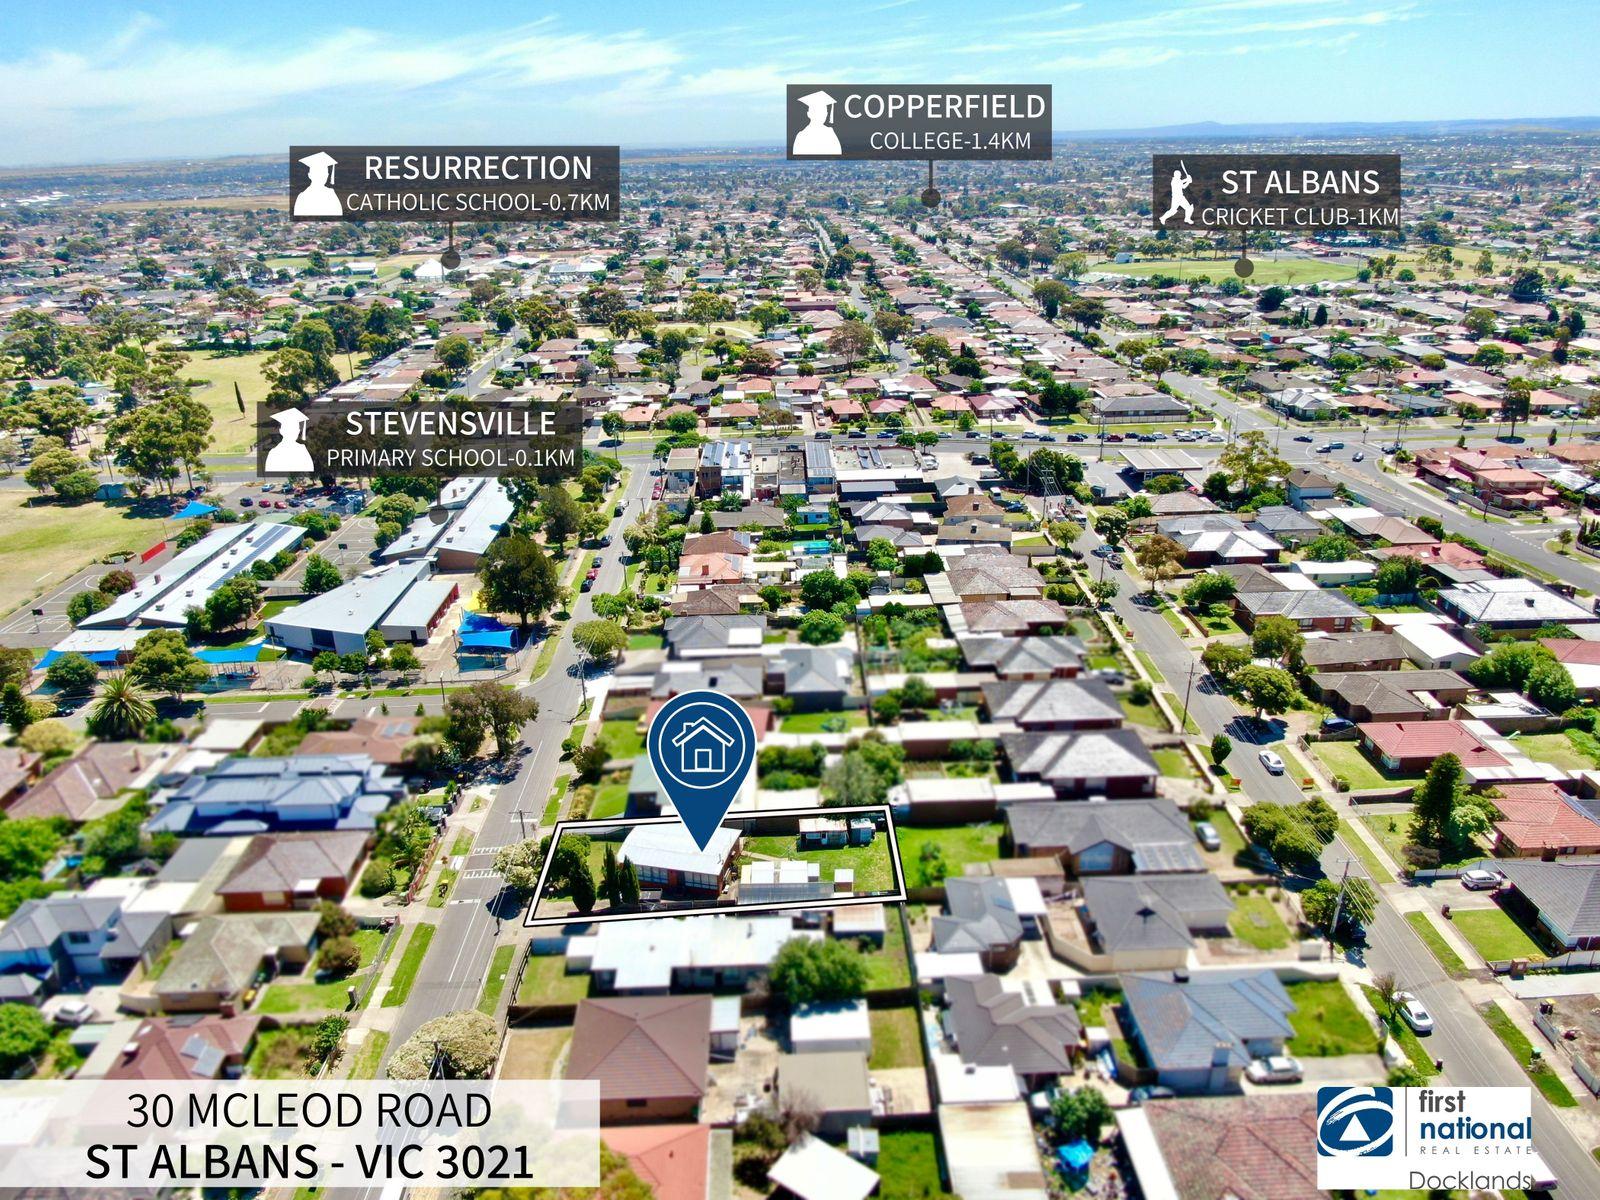 30 McLeod Road, St Albans, VIC 3021